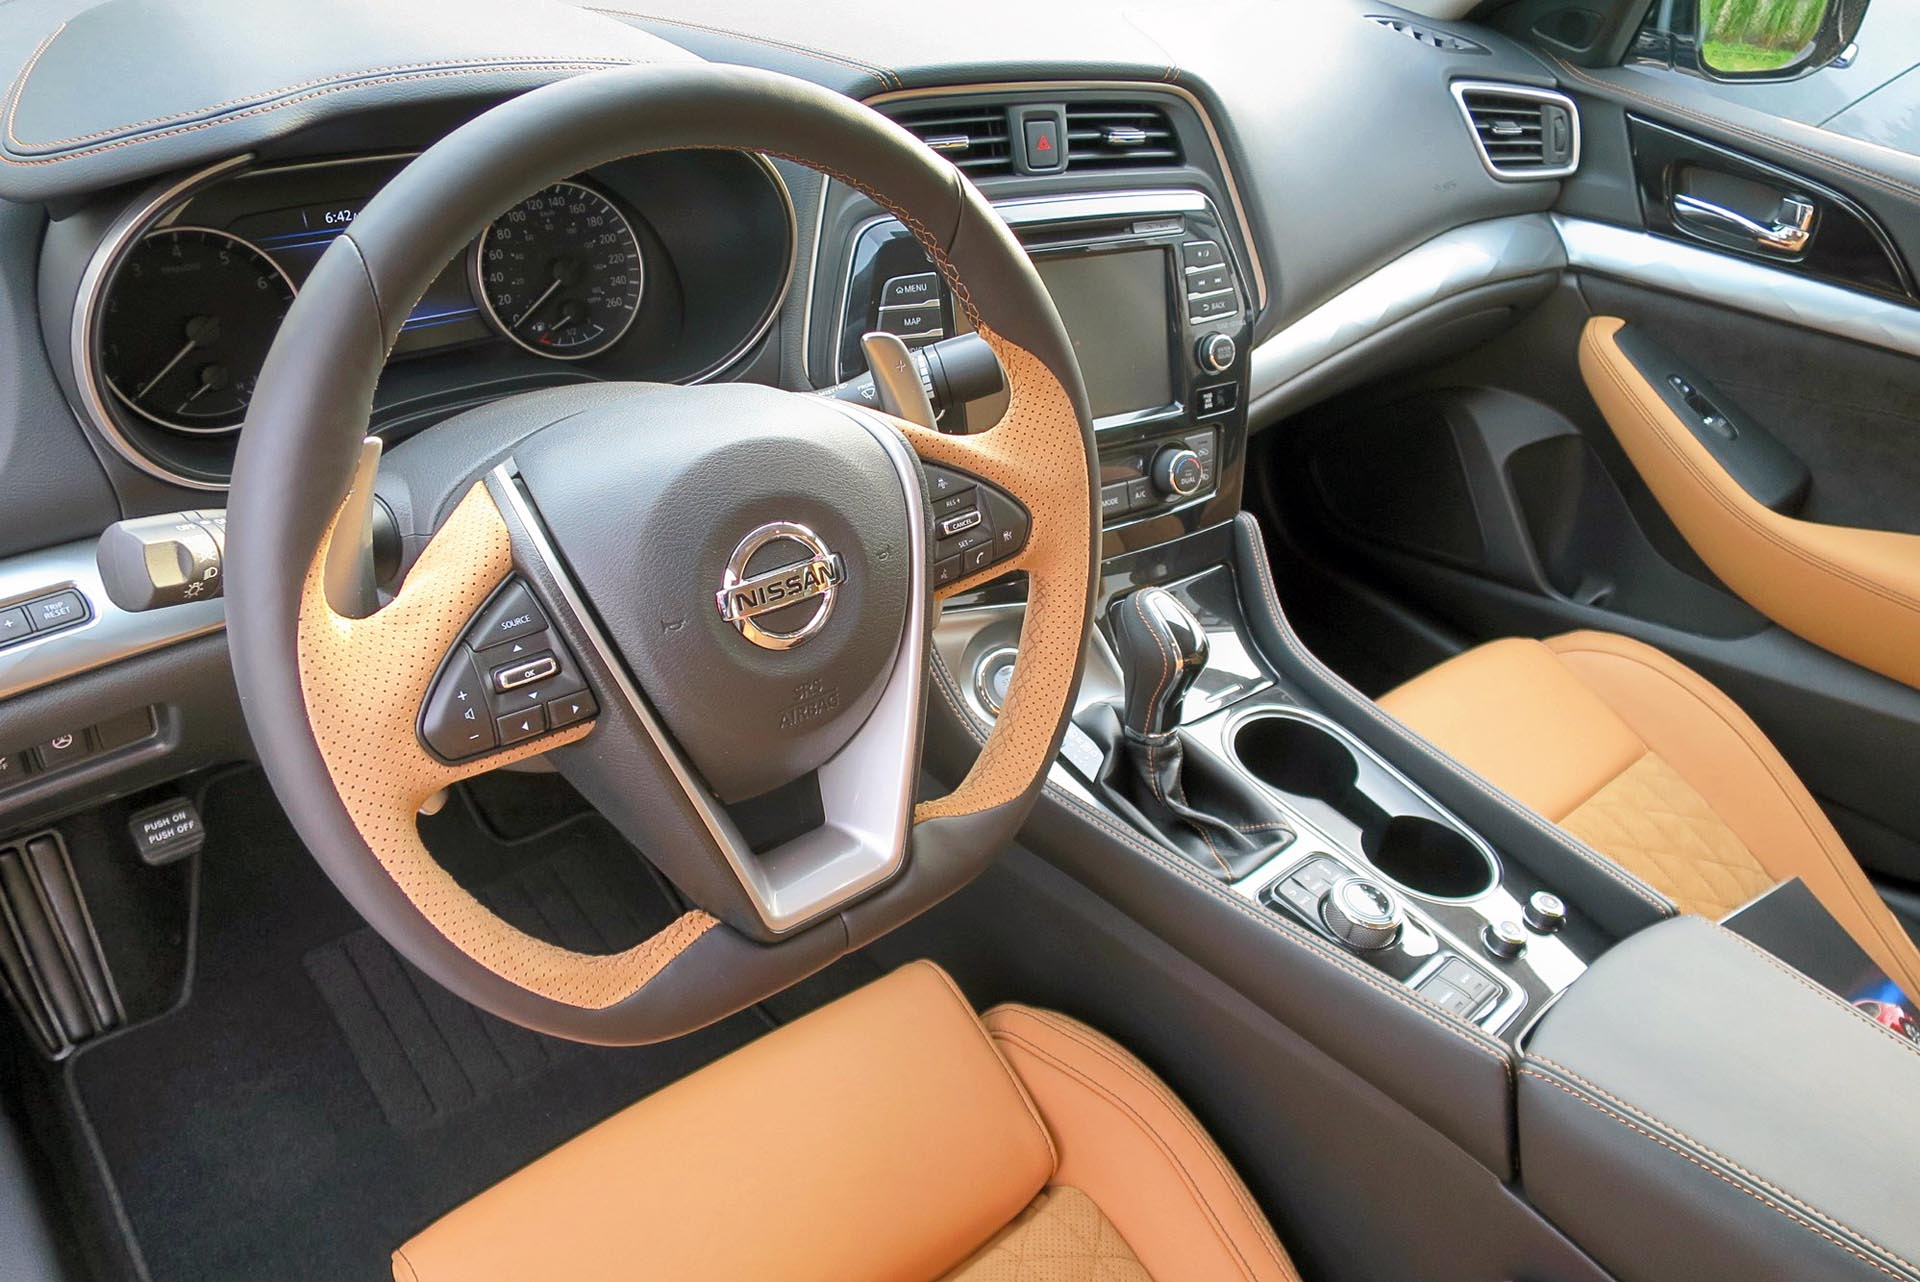 http://www.autos.ca/wp-content/uploads/2015/07/2016-Nissan-Maxima-SR-PW-09.jpg